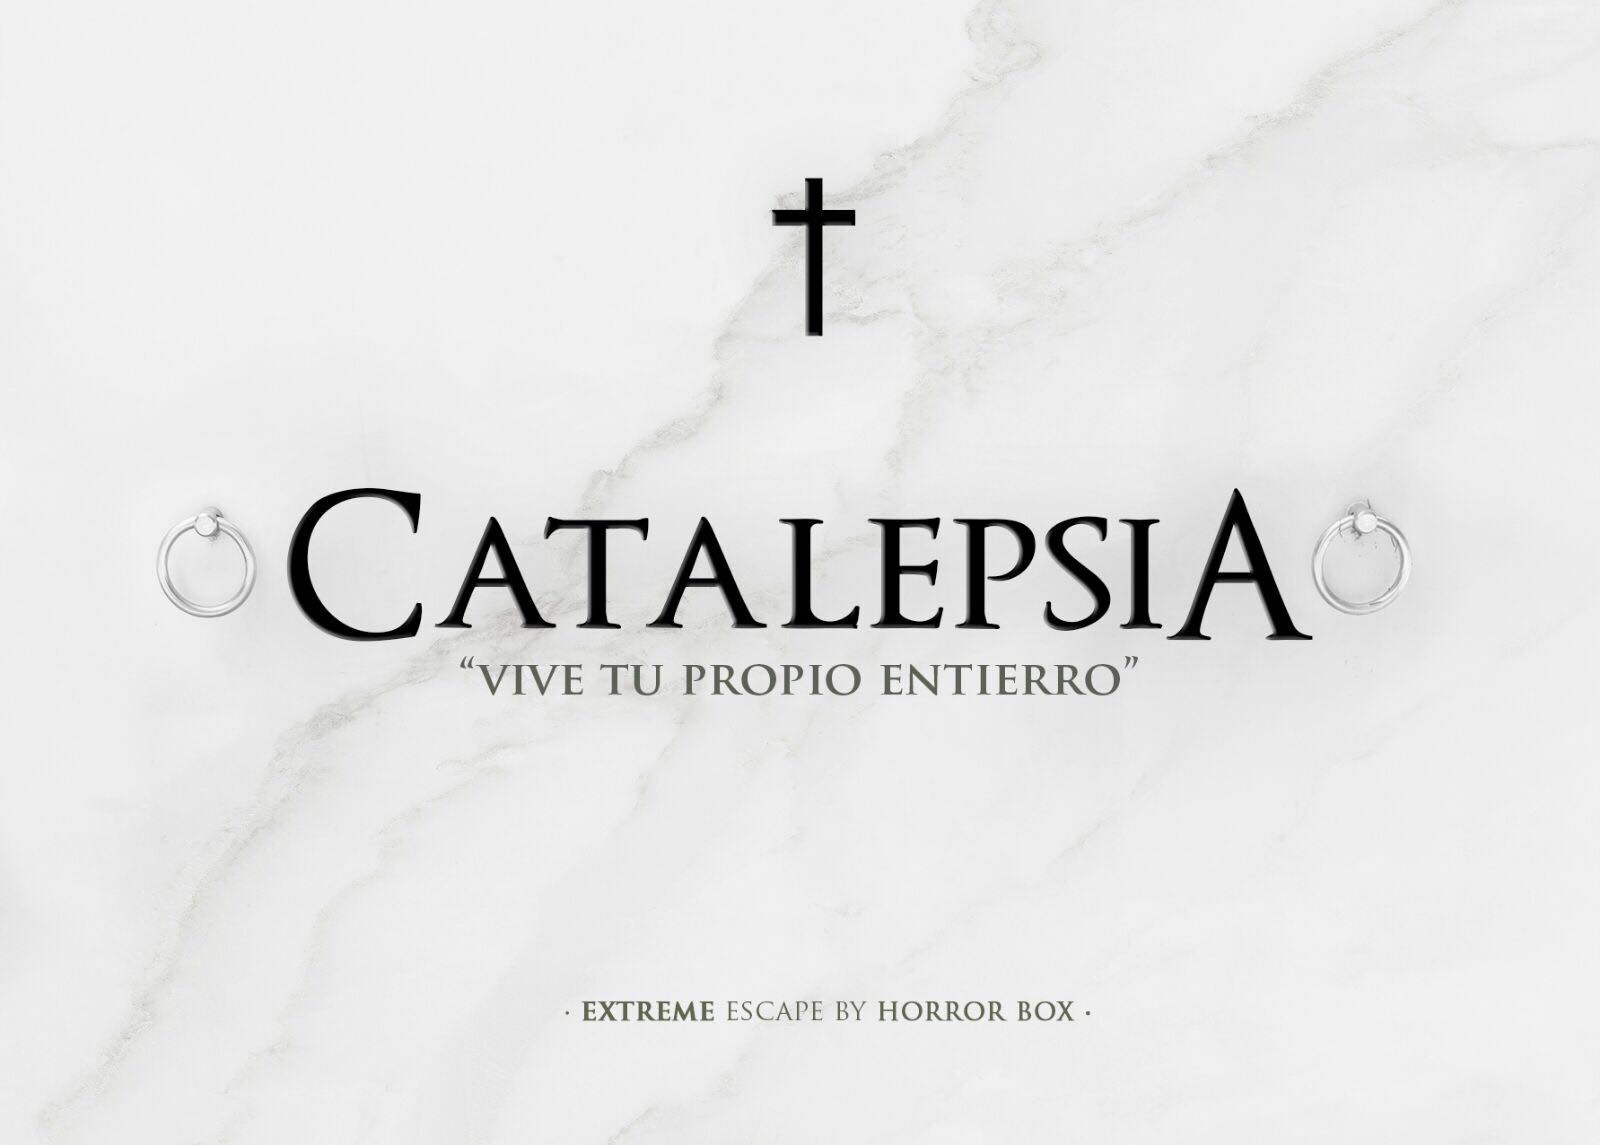 Catalepsia